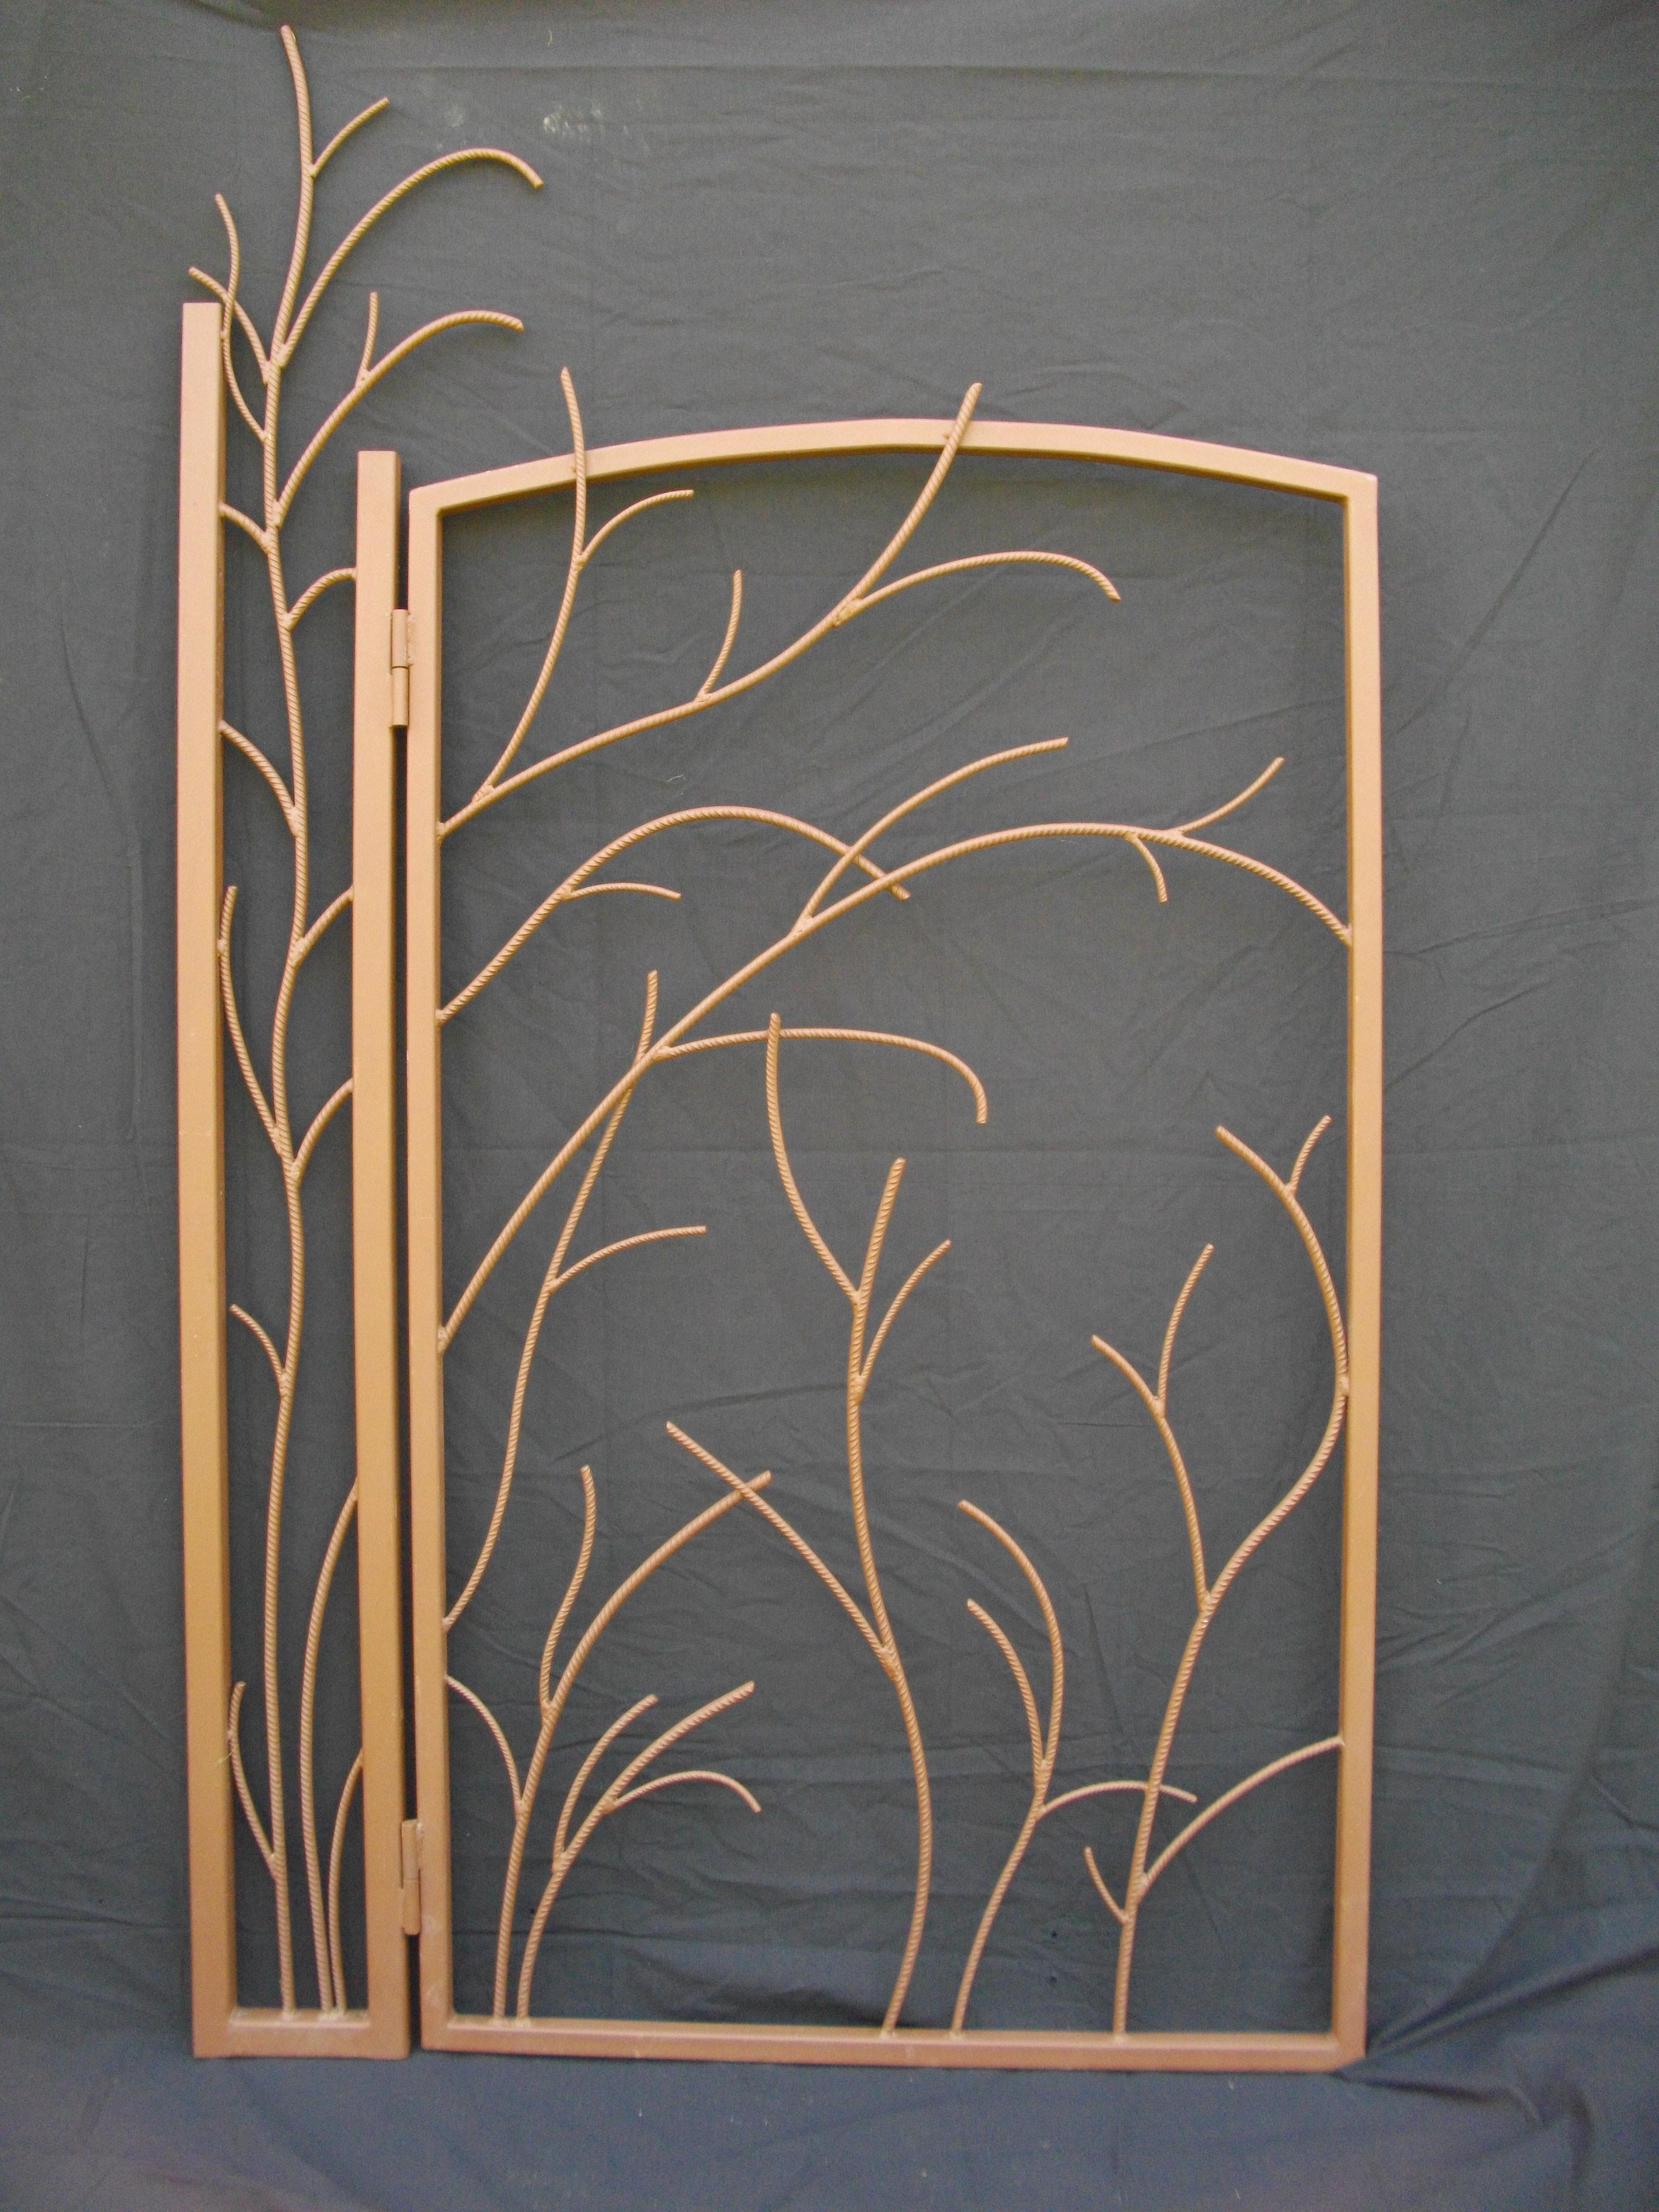 portillon metal portails acier ou m tal nantes sarl fran ois nantes portillon contemporain fp. Black Bedroom Furniture Sets. Home Design Ideas